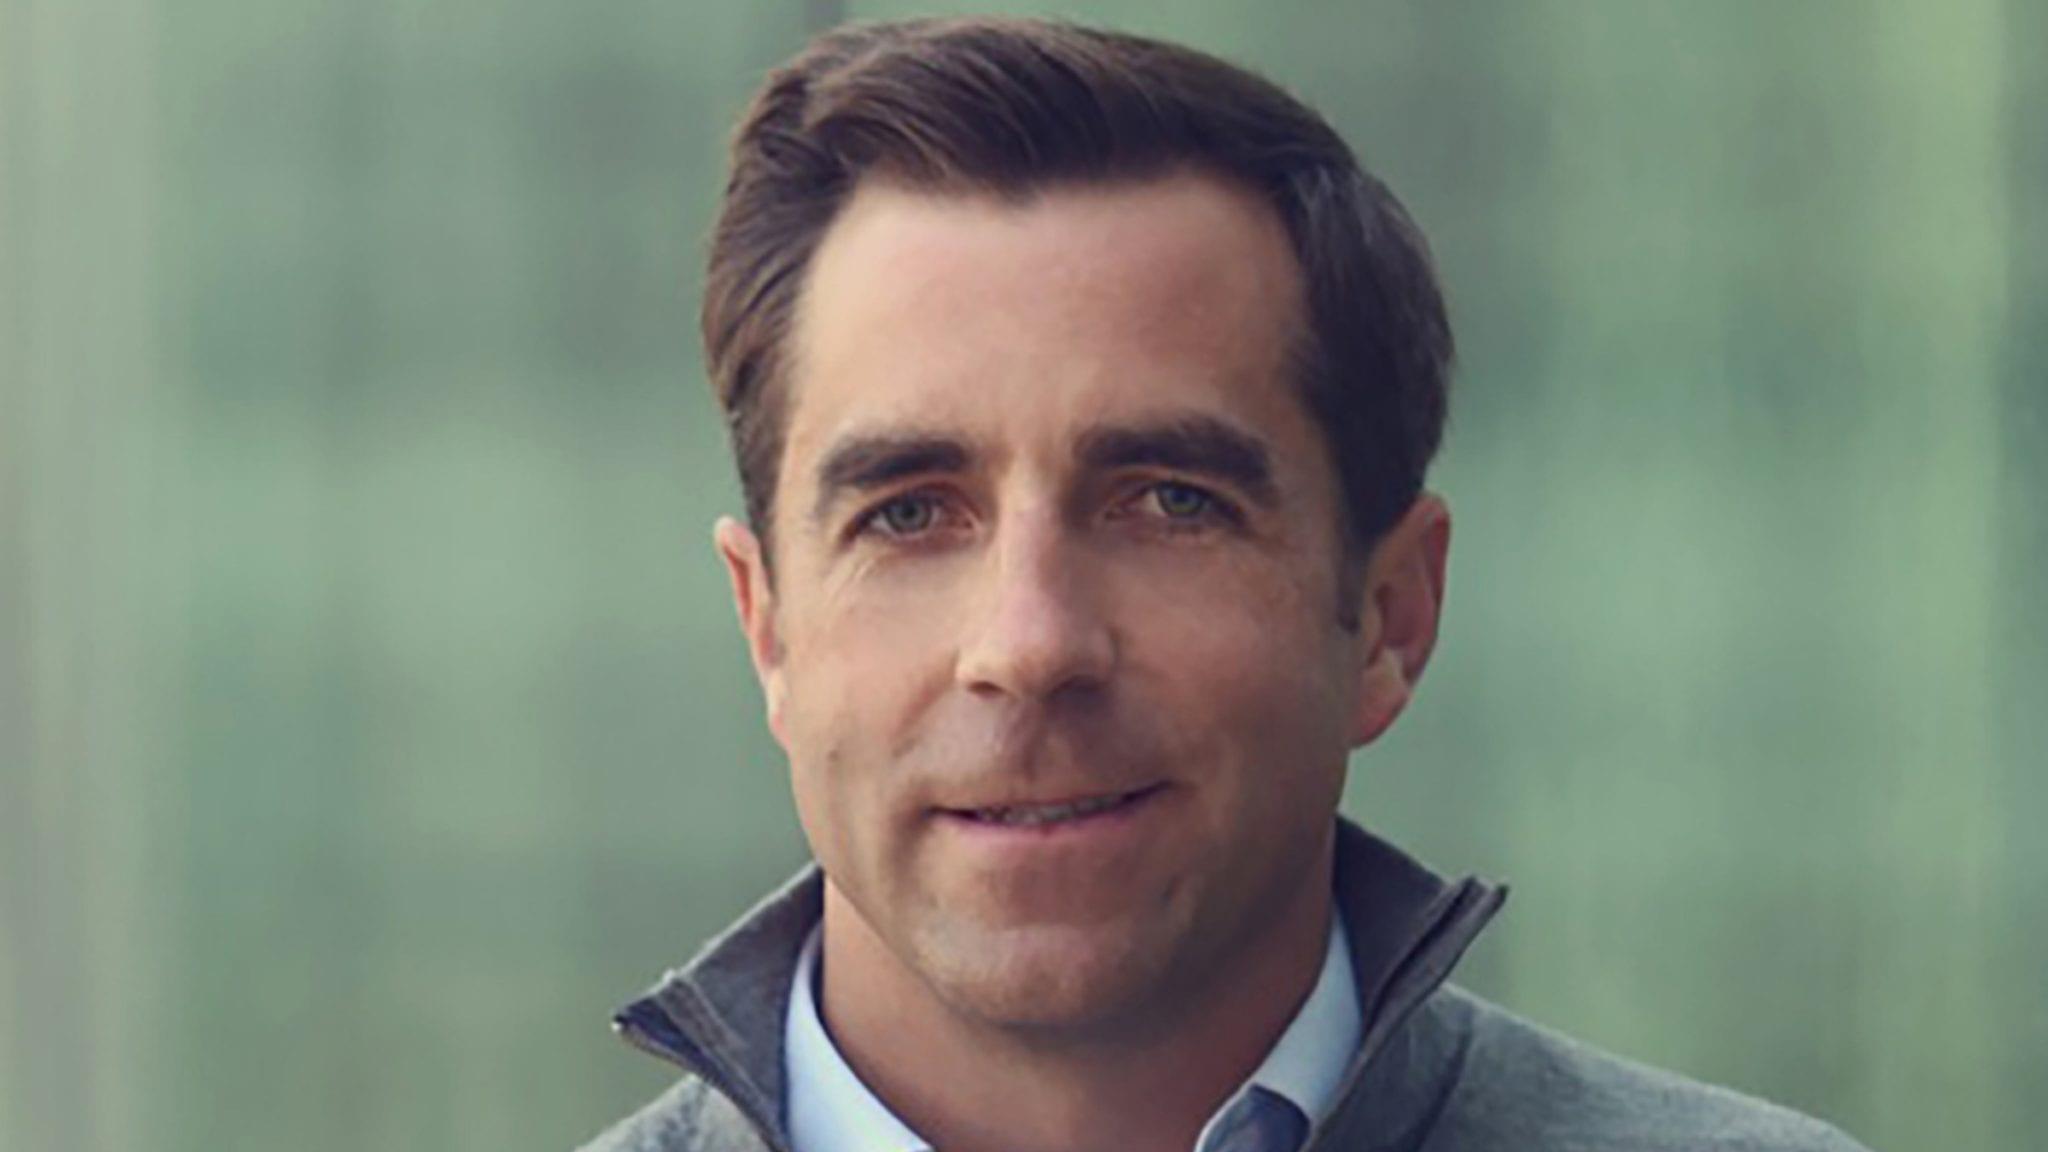 Biogen hands Denali $1B-plus in cash, $1B-plus in milestones to partner on late-stage Parkinson's drug